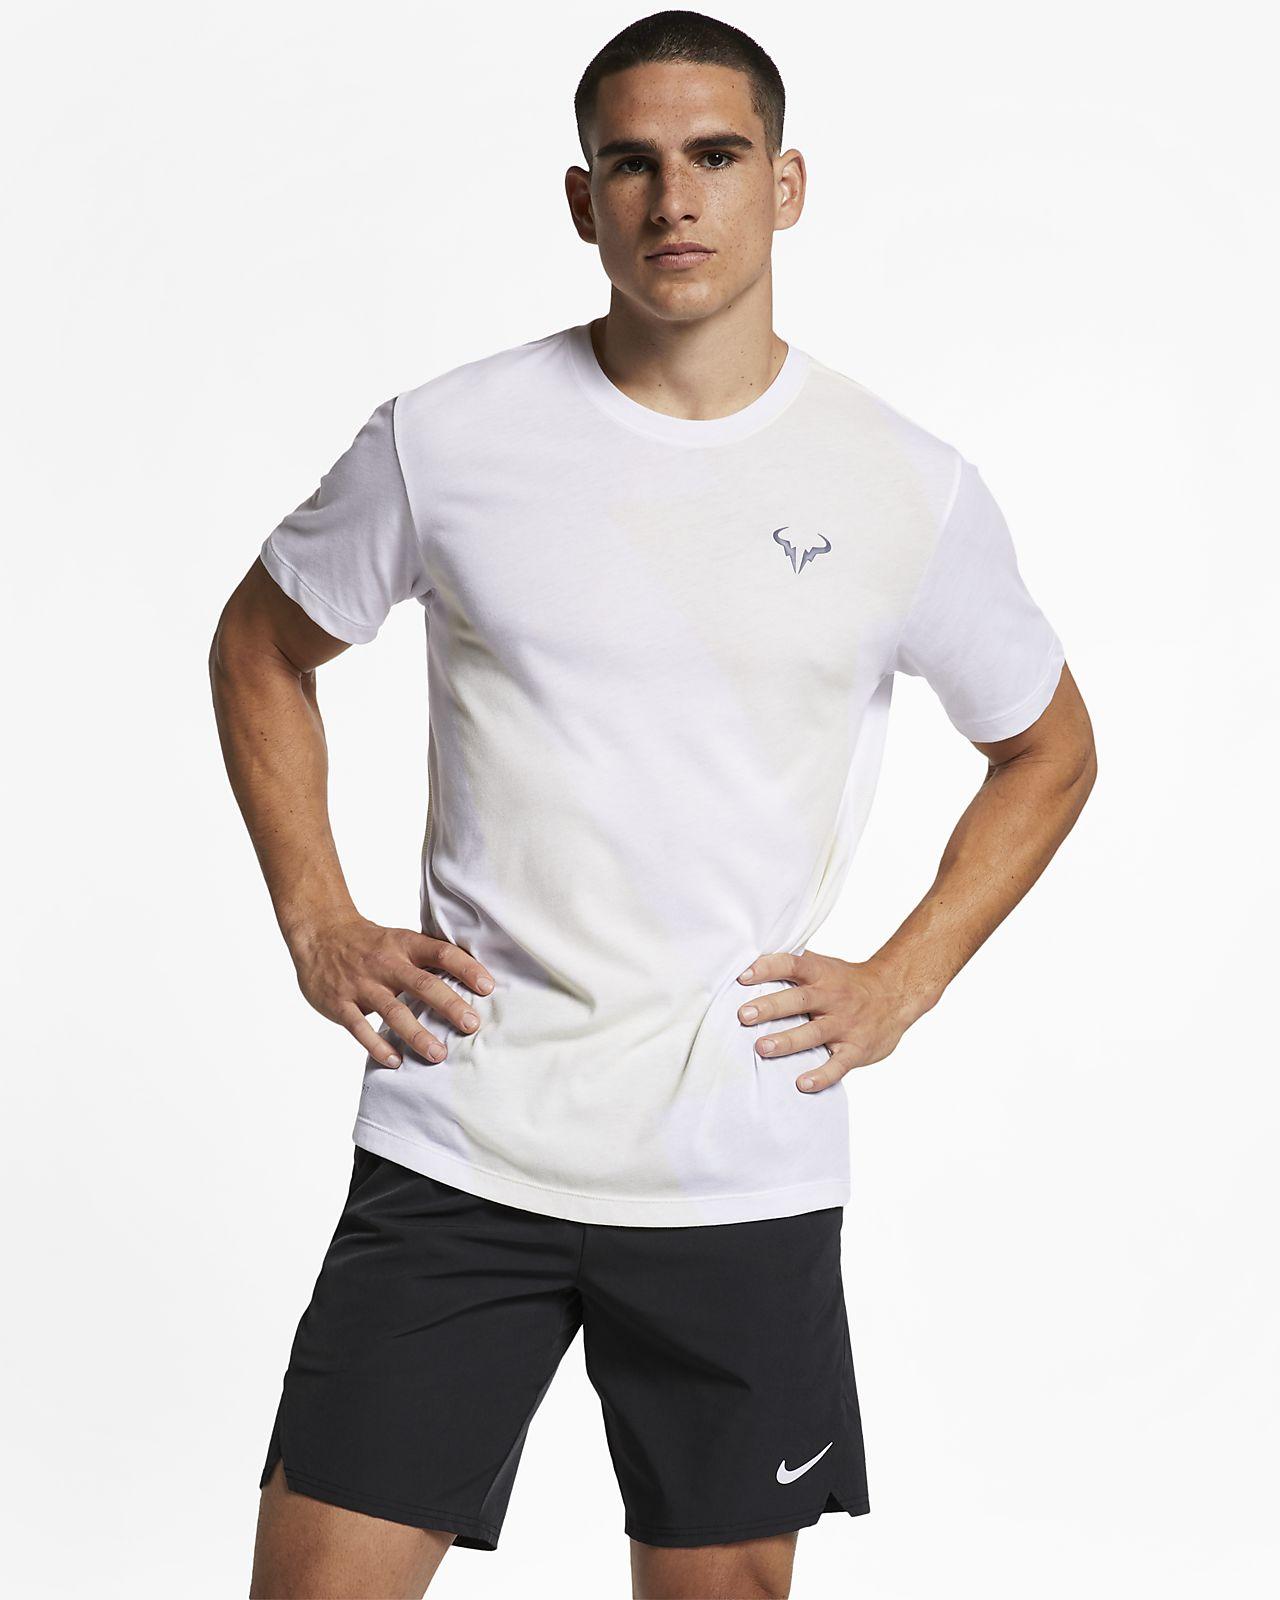 d7ae774326 Rafa Men's Tennis T-Shirt